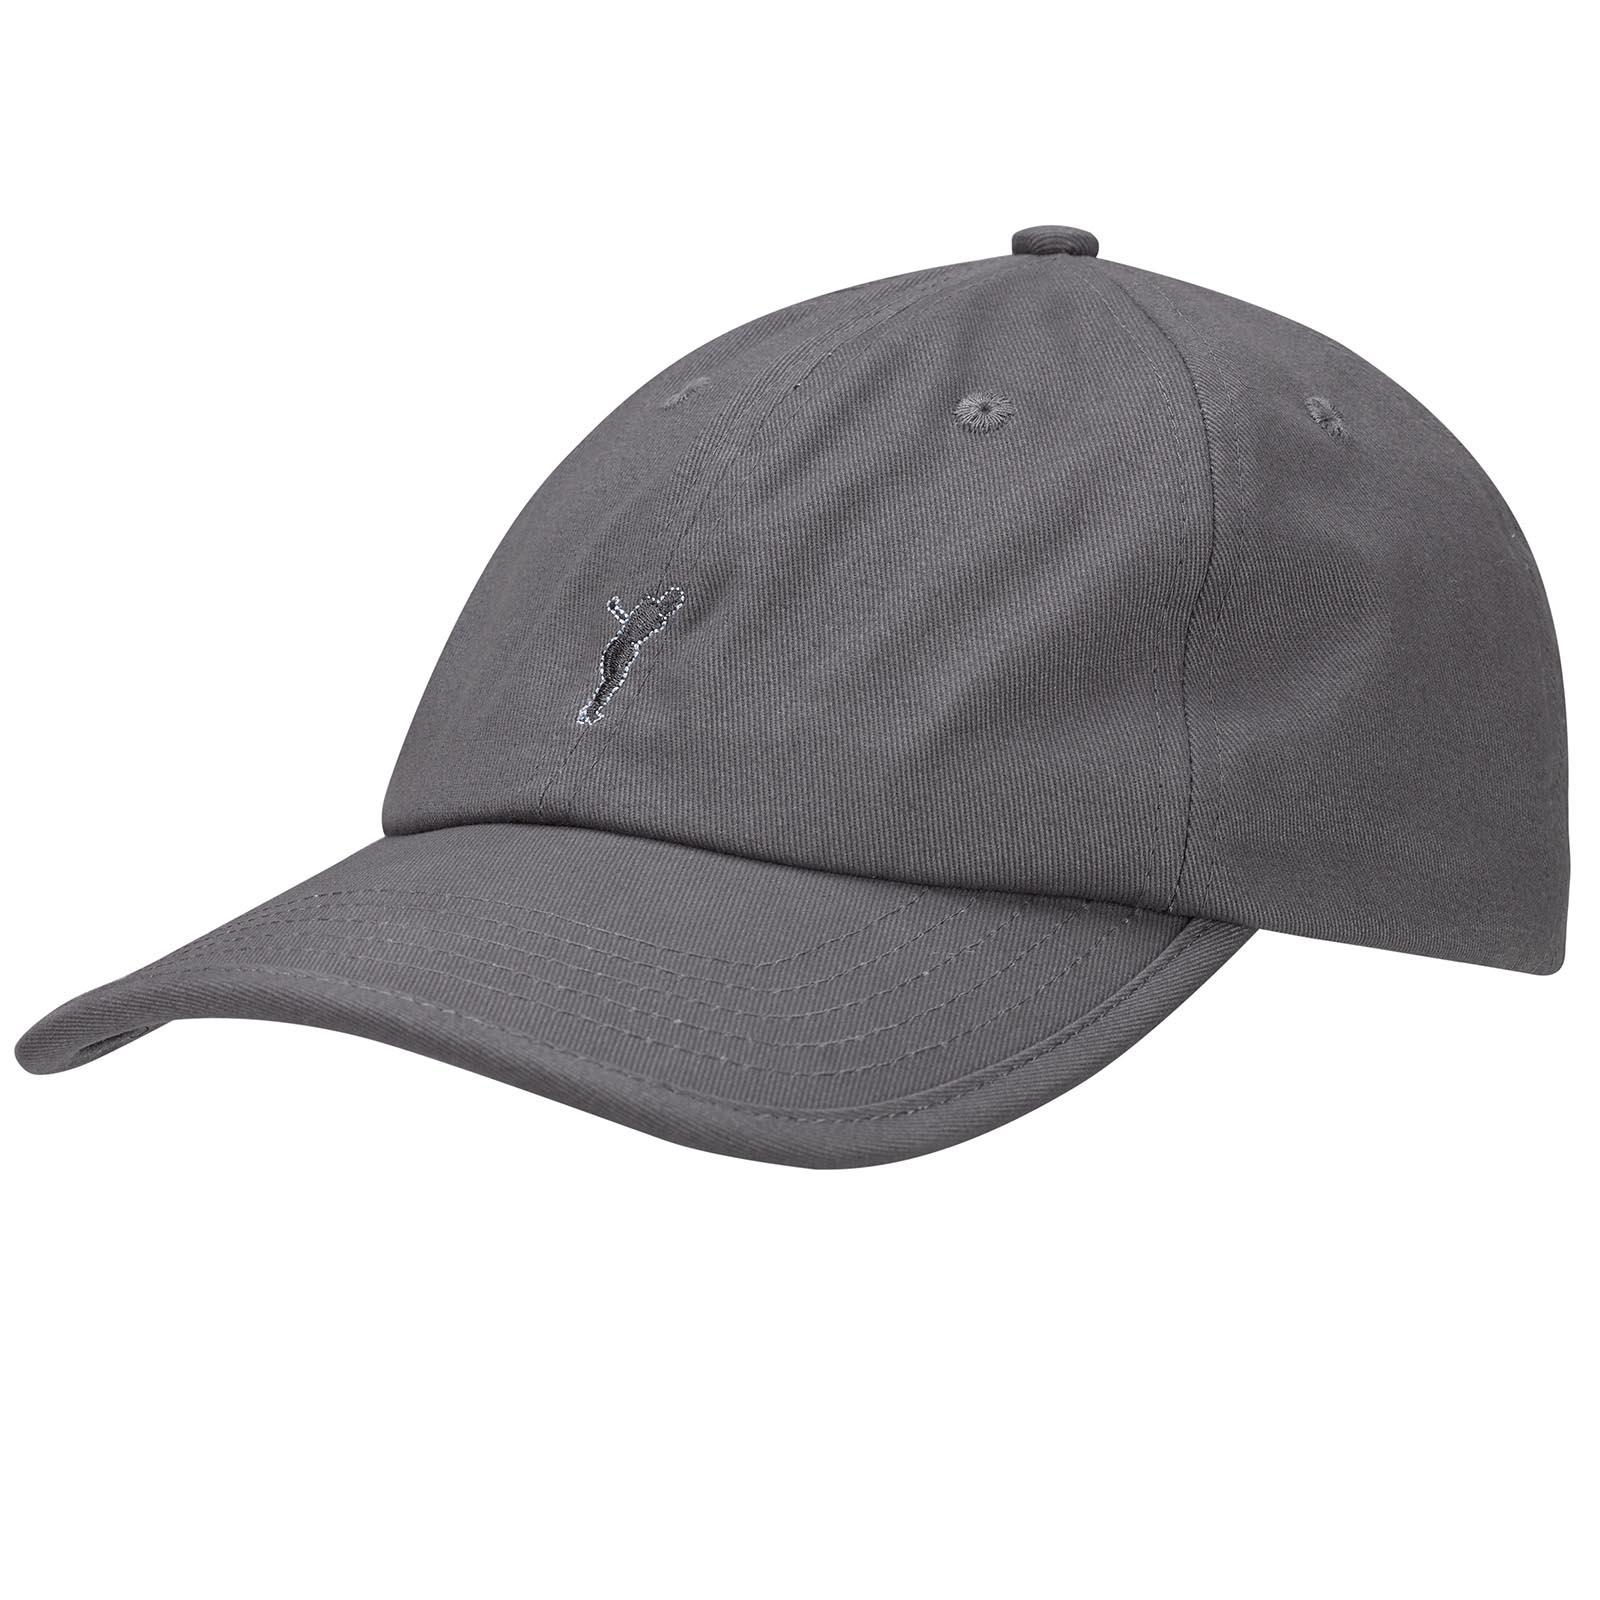 943f5bf99 High Tech Performance men's cotton golf cap (one size)